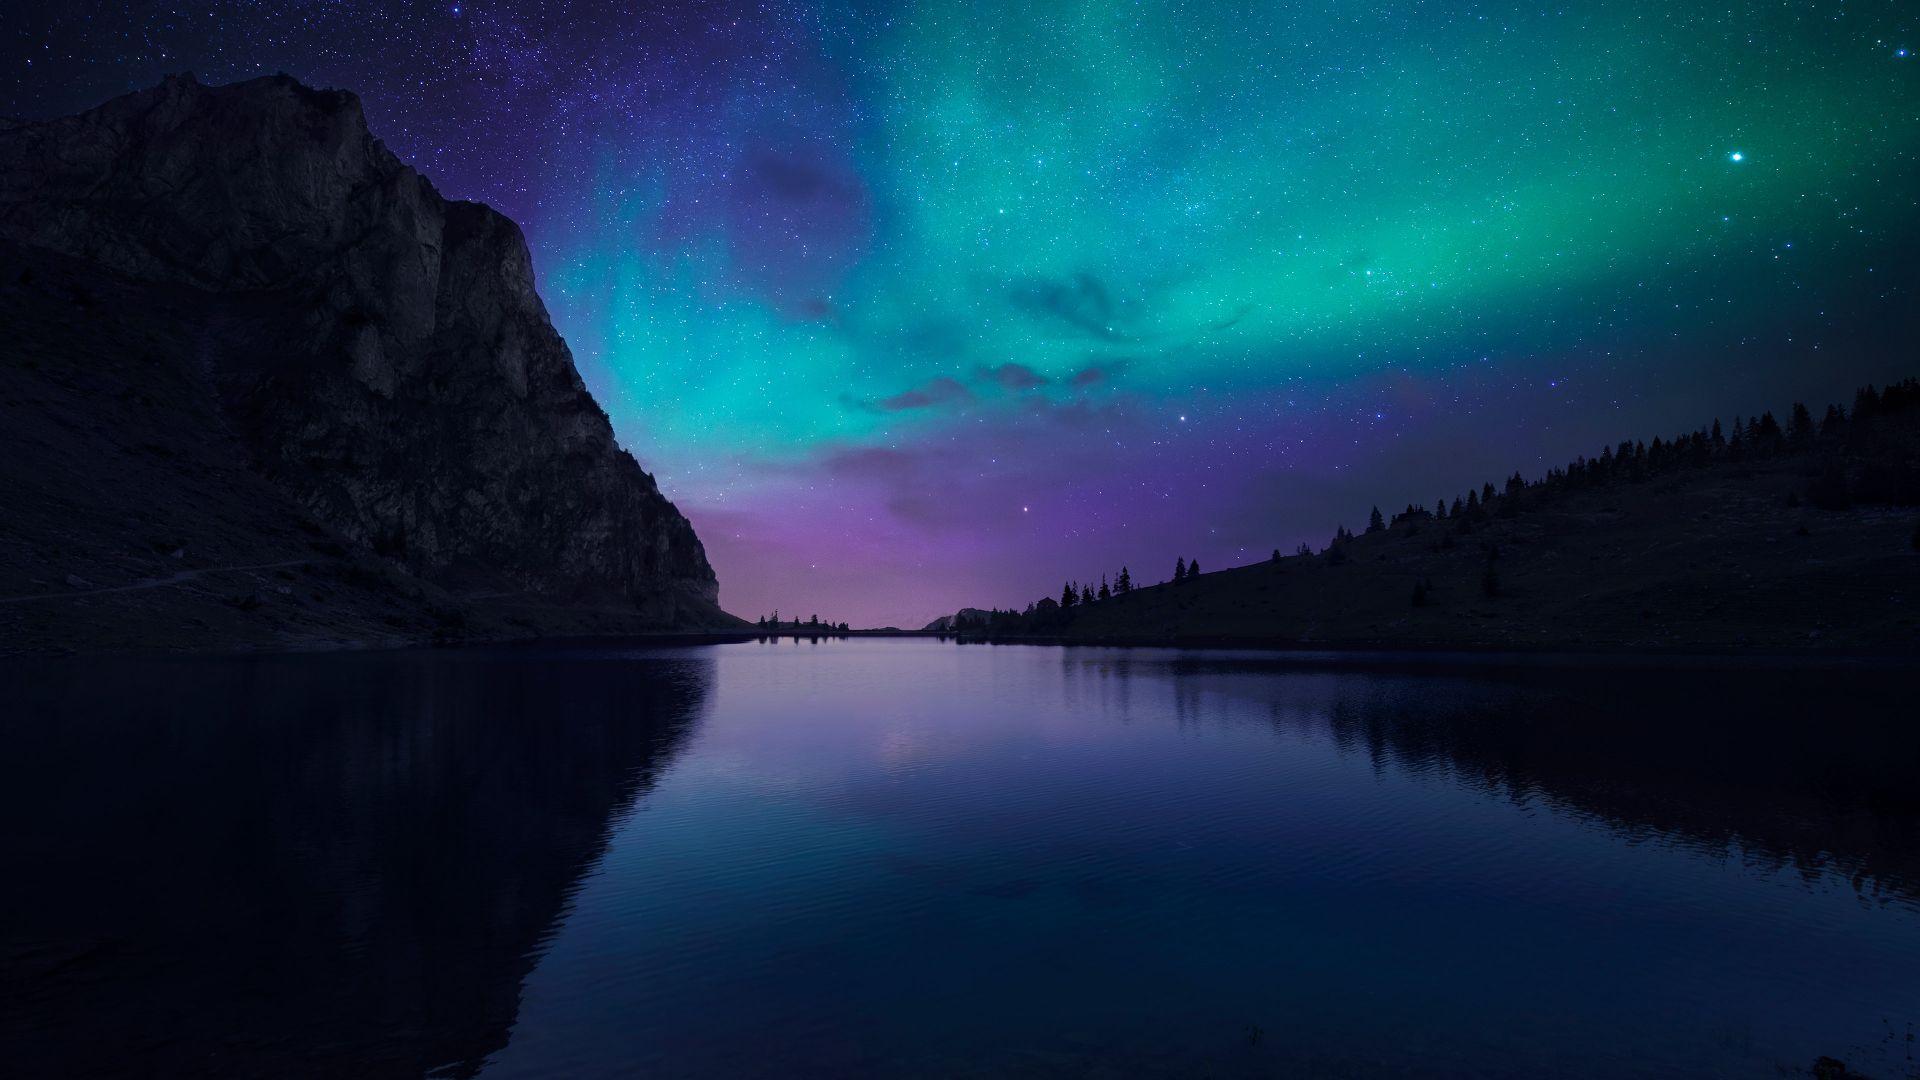 Lake Aurora 4k Hd Wallpaper Florida Night Sky Stars